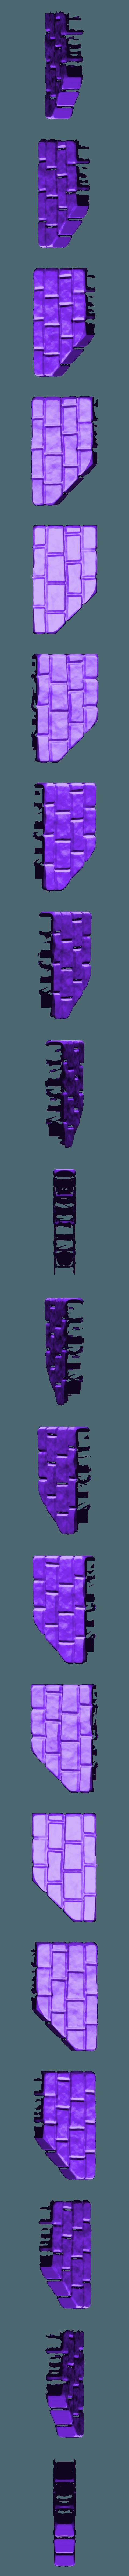 miniwall1.stl Download free STL file Fantasy city set • 3D printable model, HeribertoValle